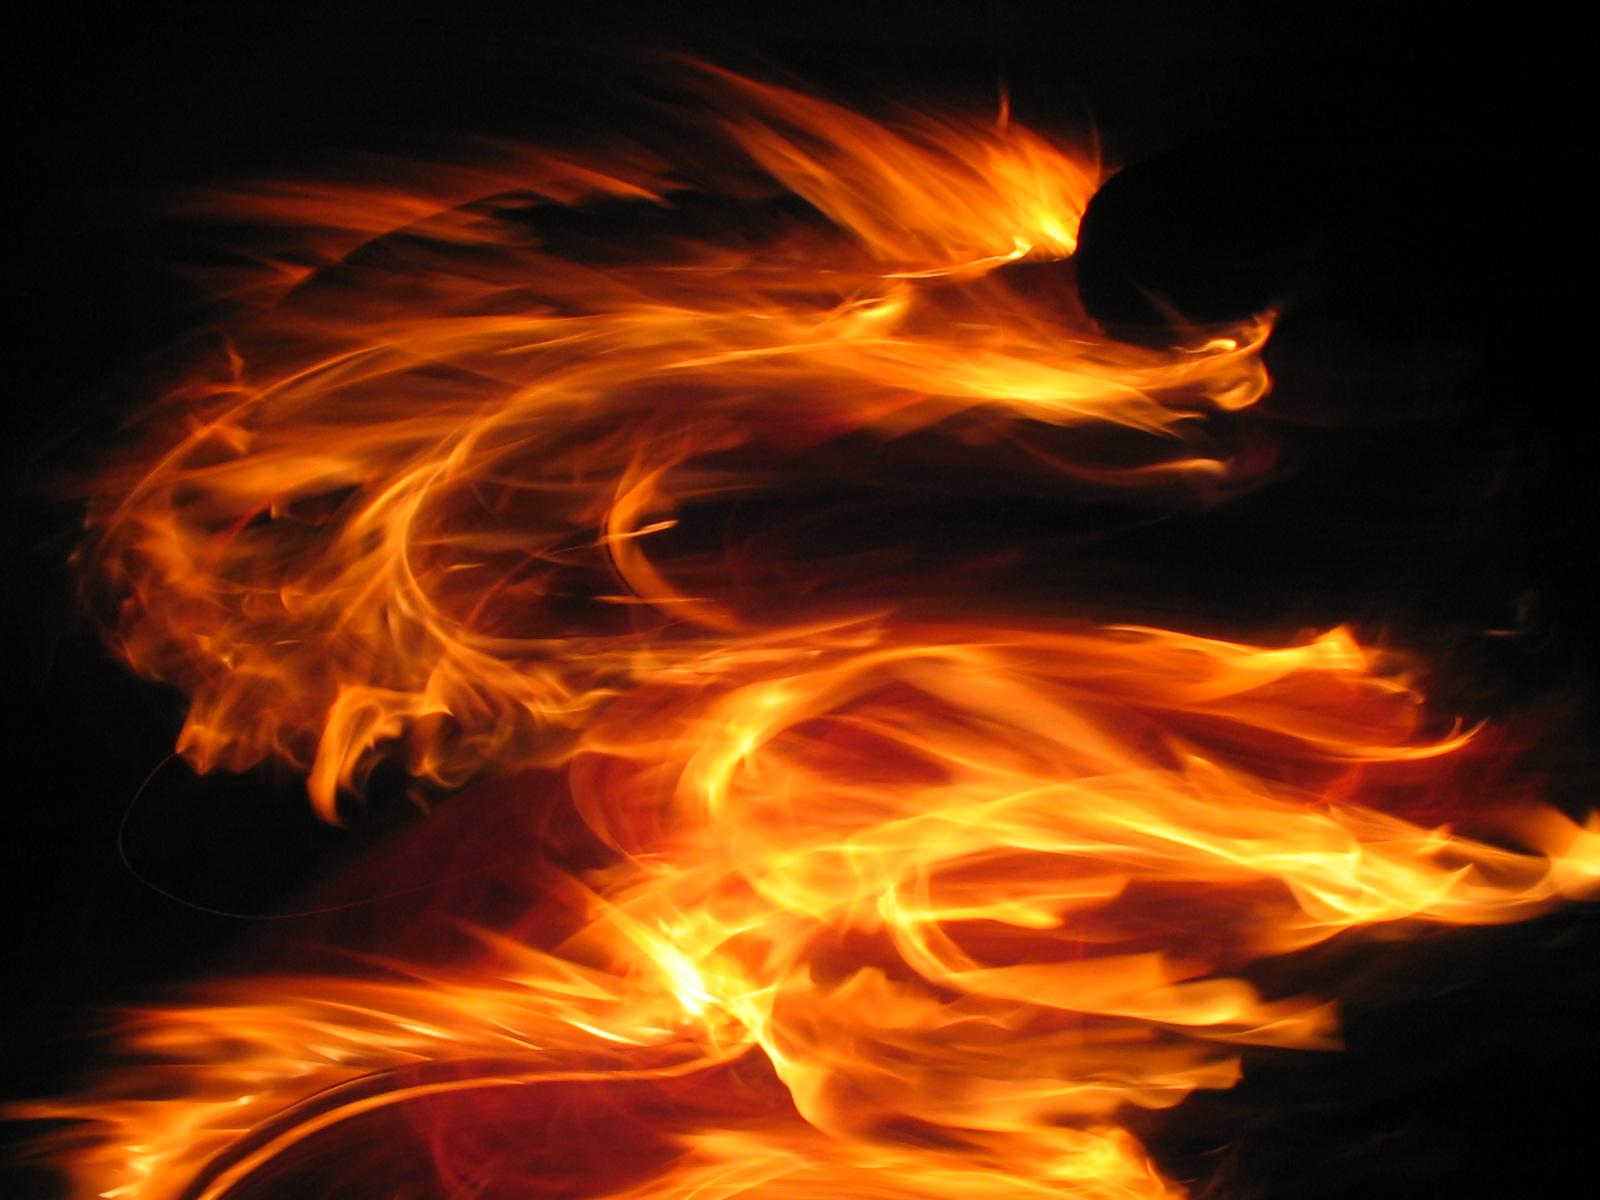 http://3.bp.blogspot.com/_gM7HAk5JYvI/TSEbuuKreoI/AAAAAAAAAHg/_97rpU5zlJk/s1600/fire_dragon.jpg